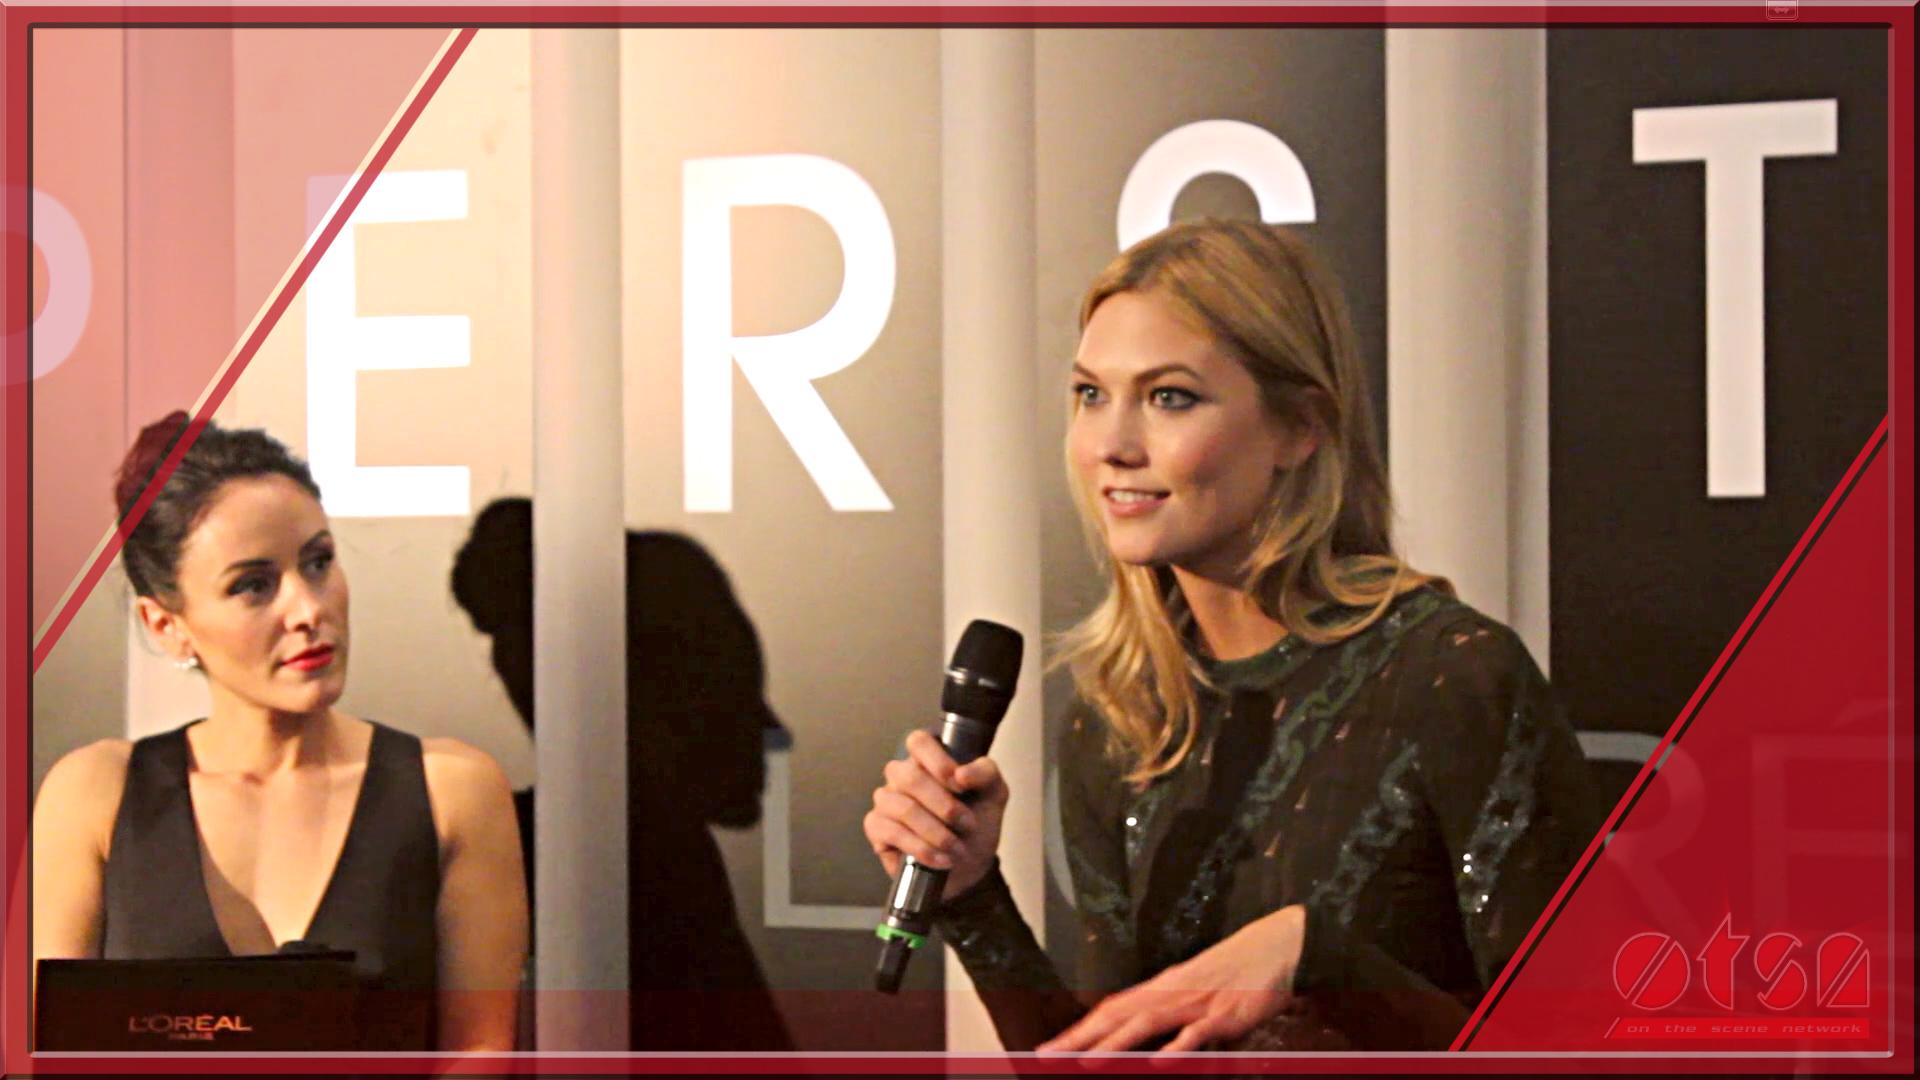 L'Oréal Paris TIFF kick-off with Karlie Kloss